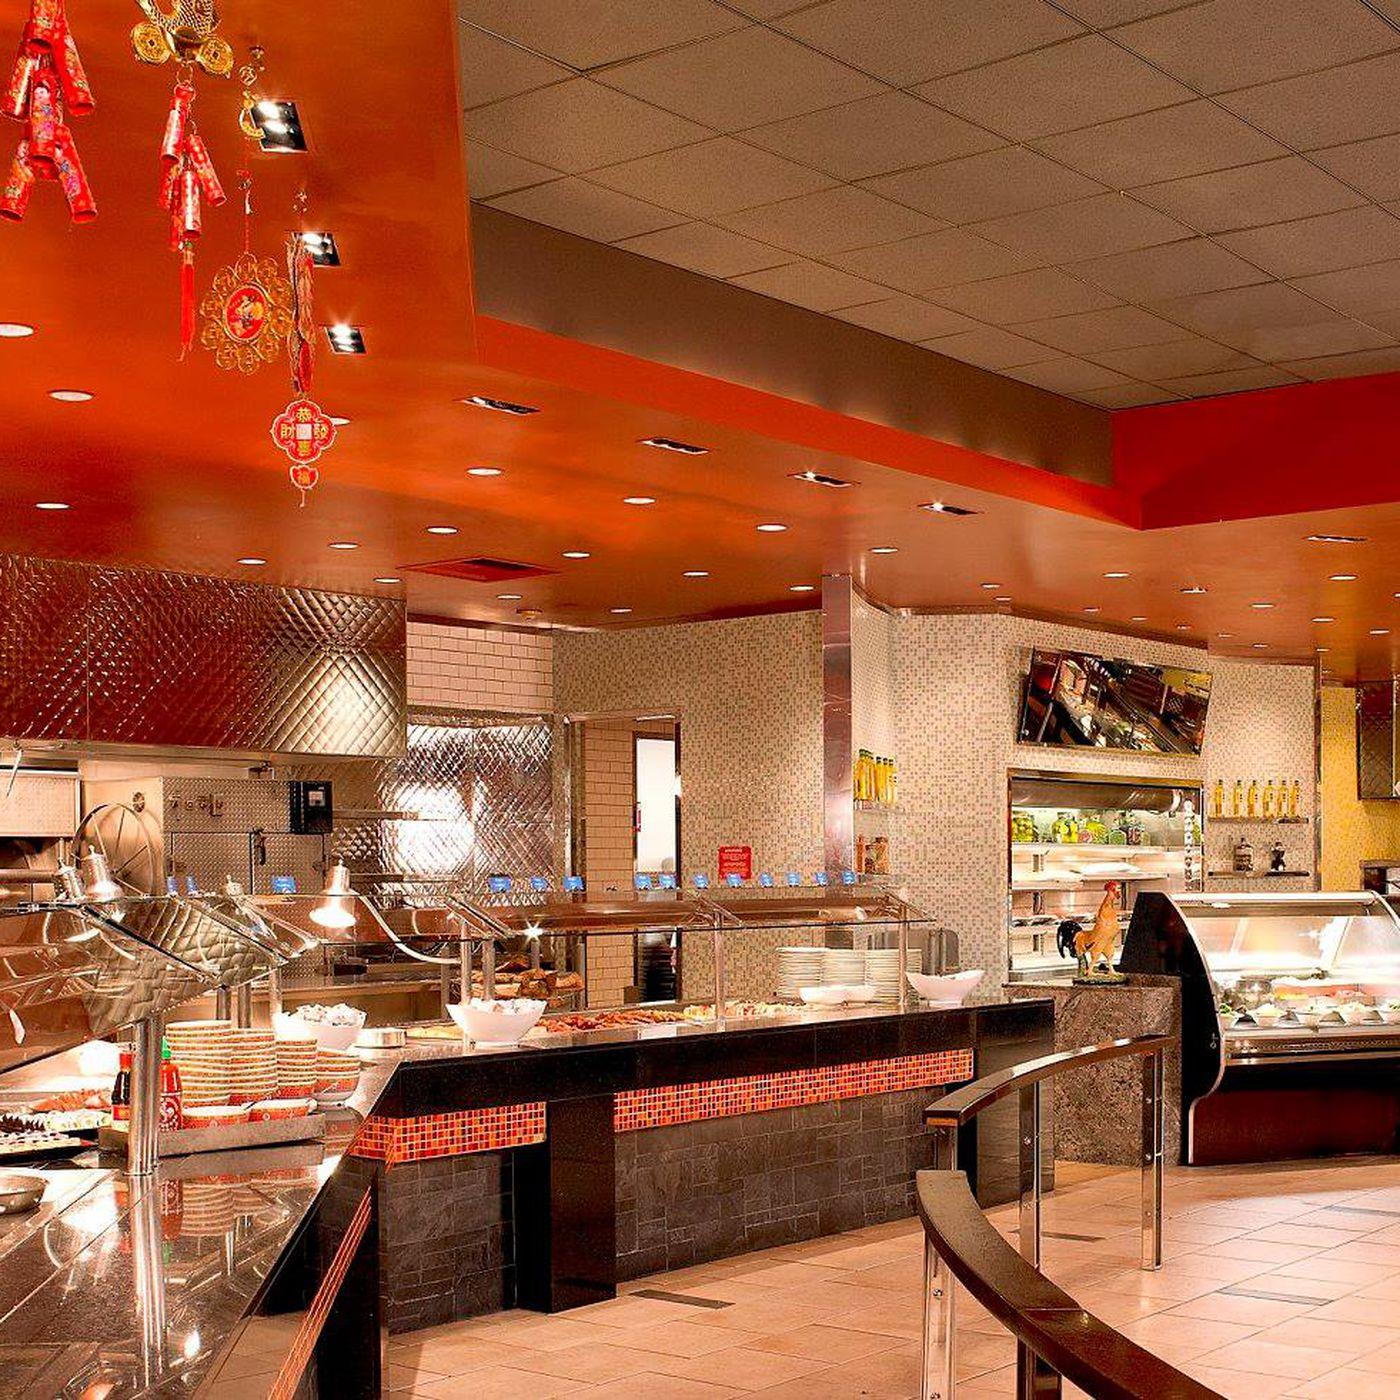 3 6 Million Buffet Makeover At Treasure Island Eater Vegas